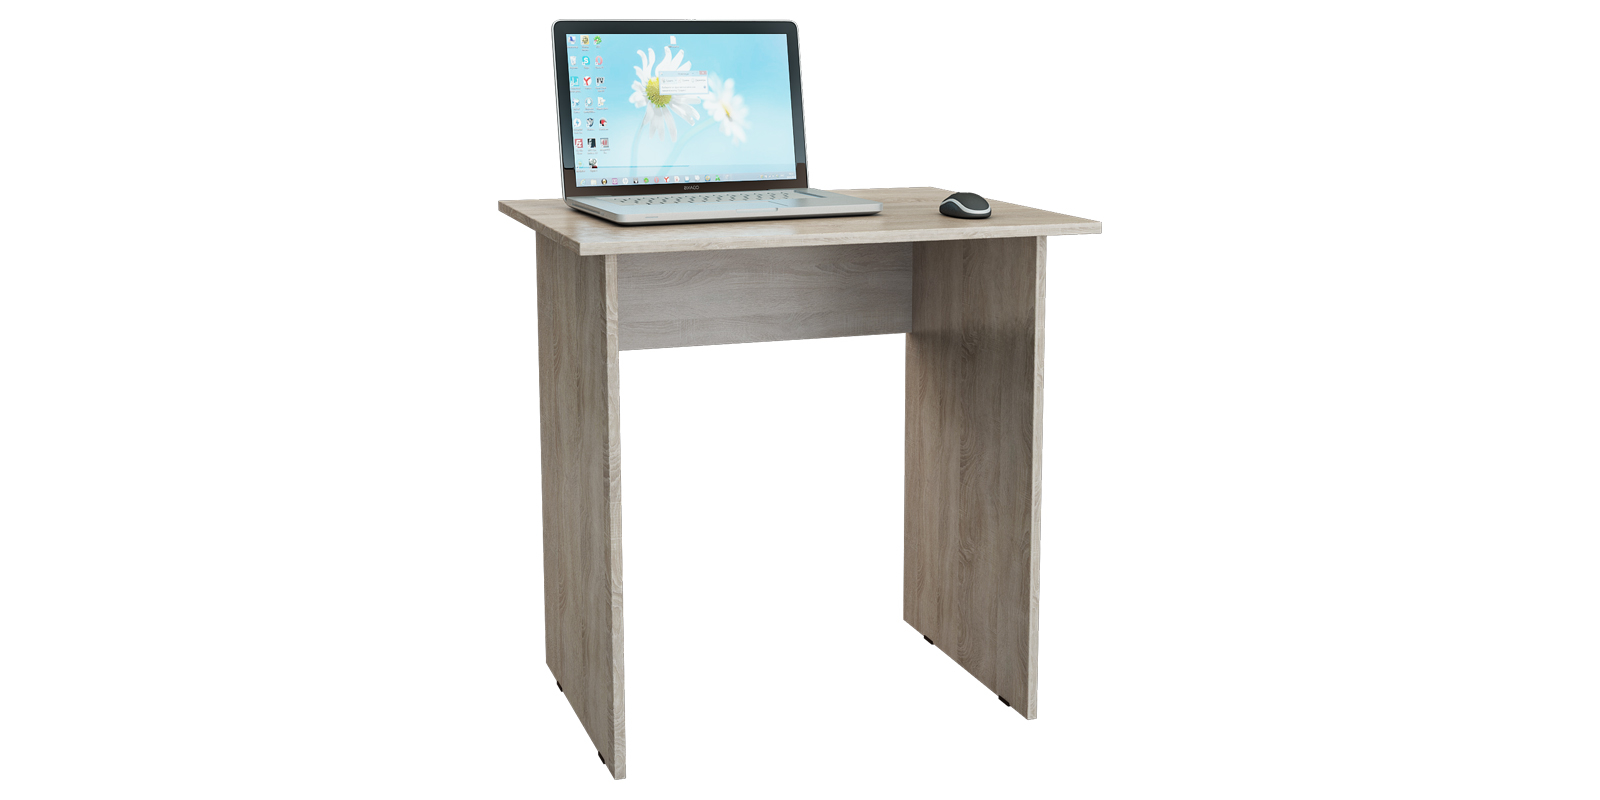 Письменный стол Харви вариант №2 (дуб сонома)